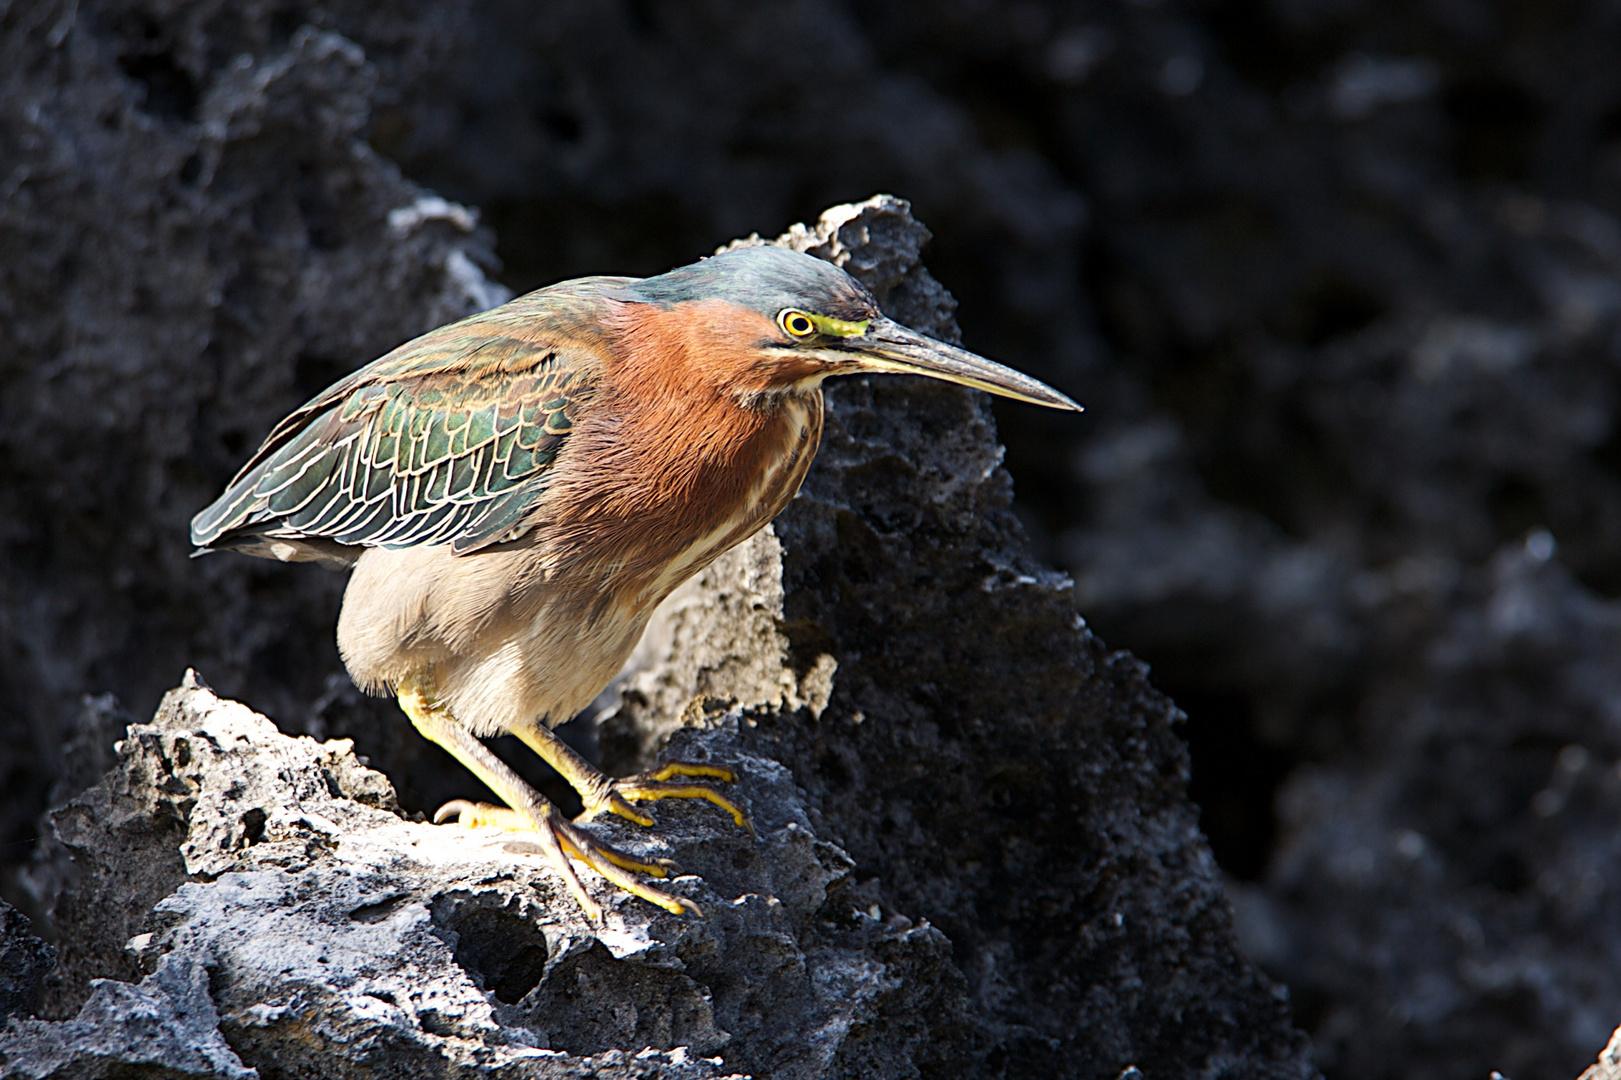 Grünreiher (Green Heron, Butorides virescens)